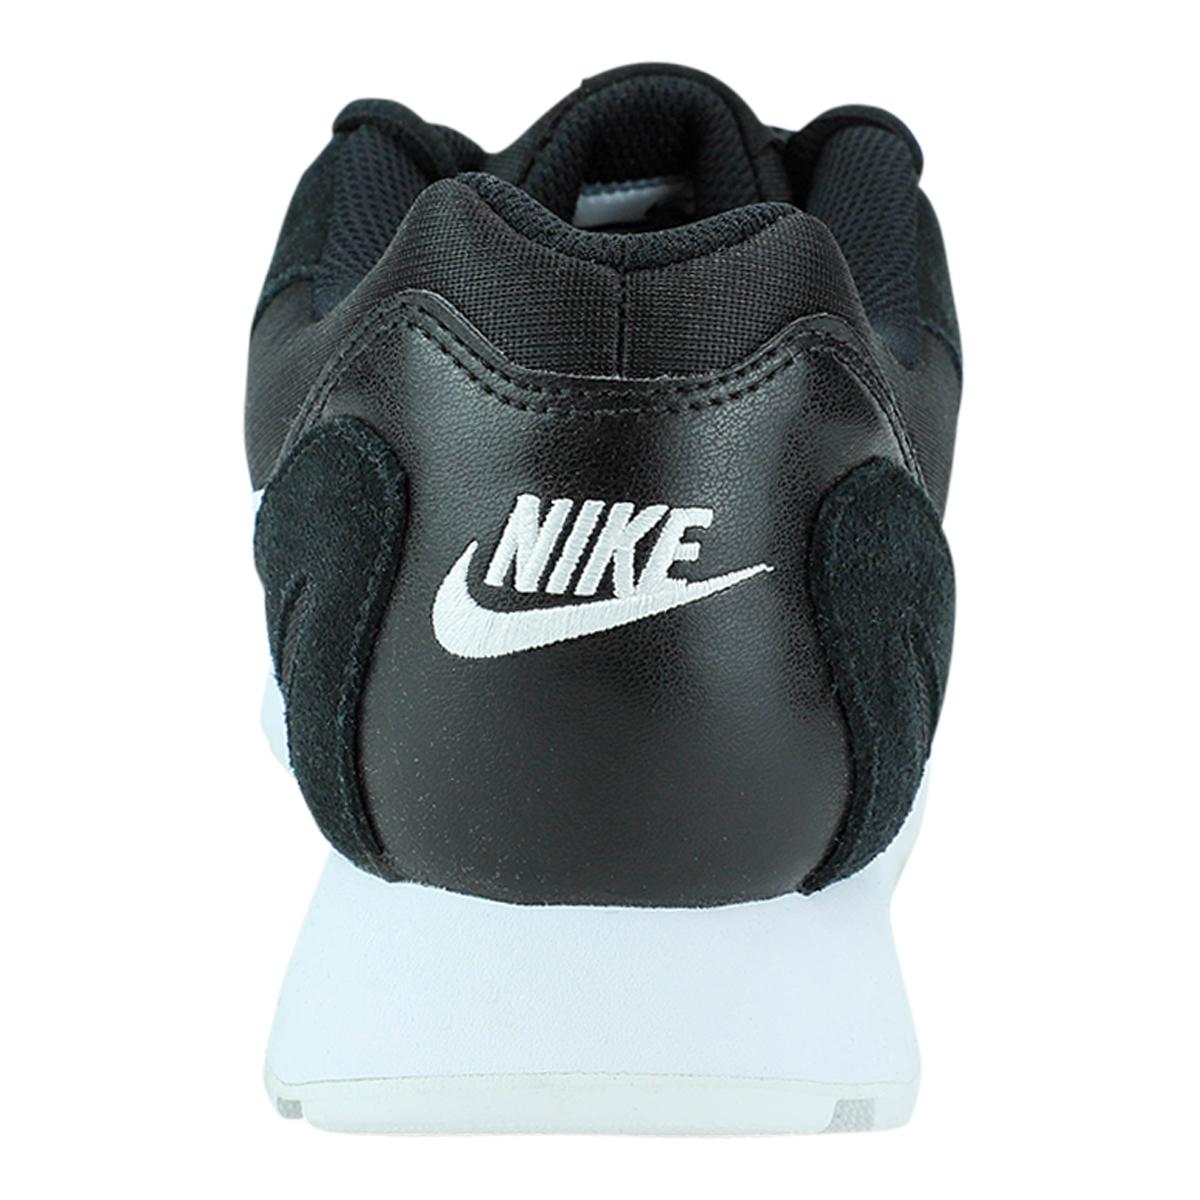 Nike-Men-039-s-Delfine-Running-Shoes thumbnail 12